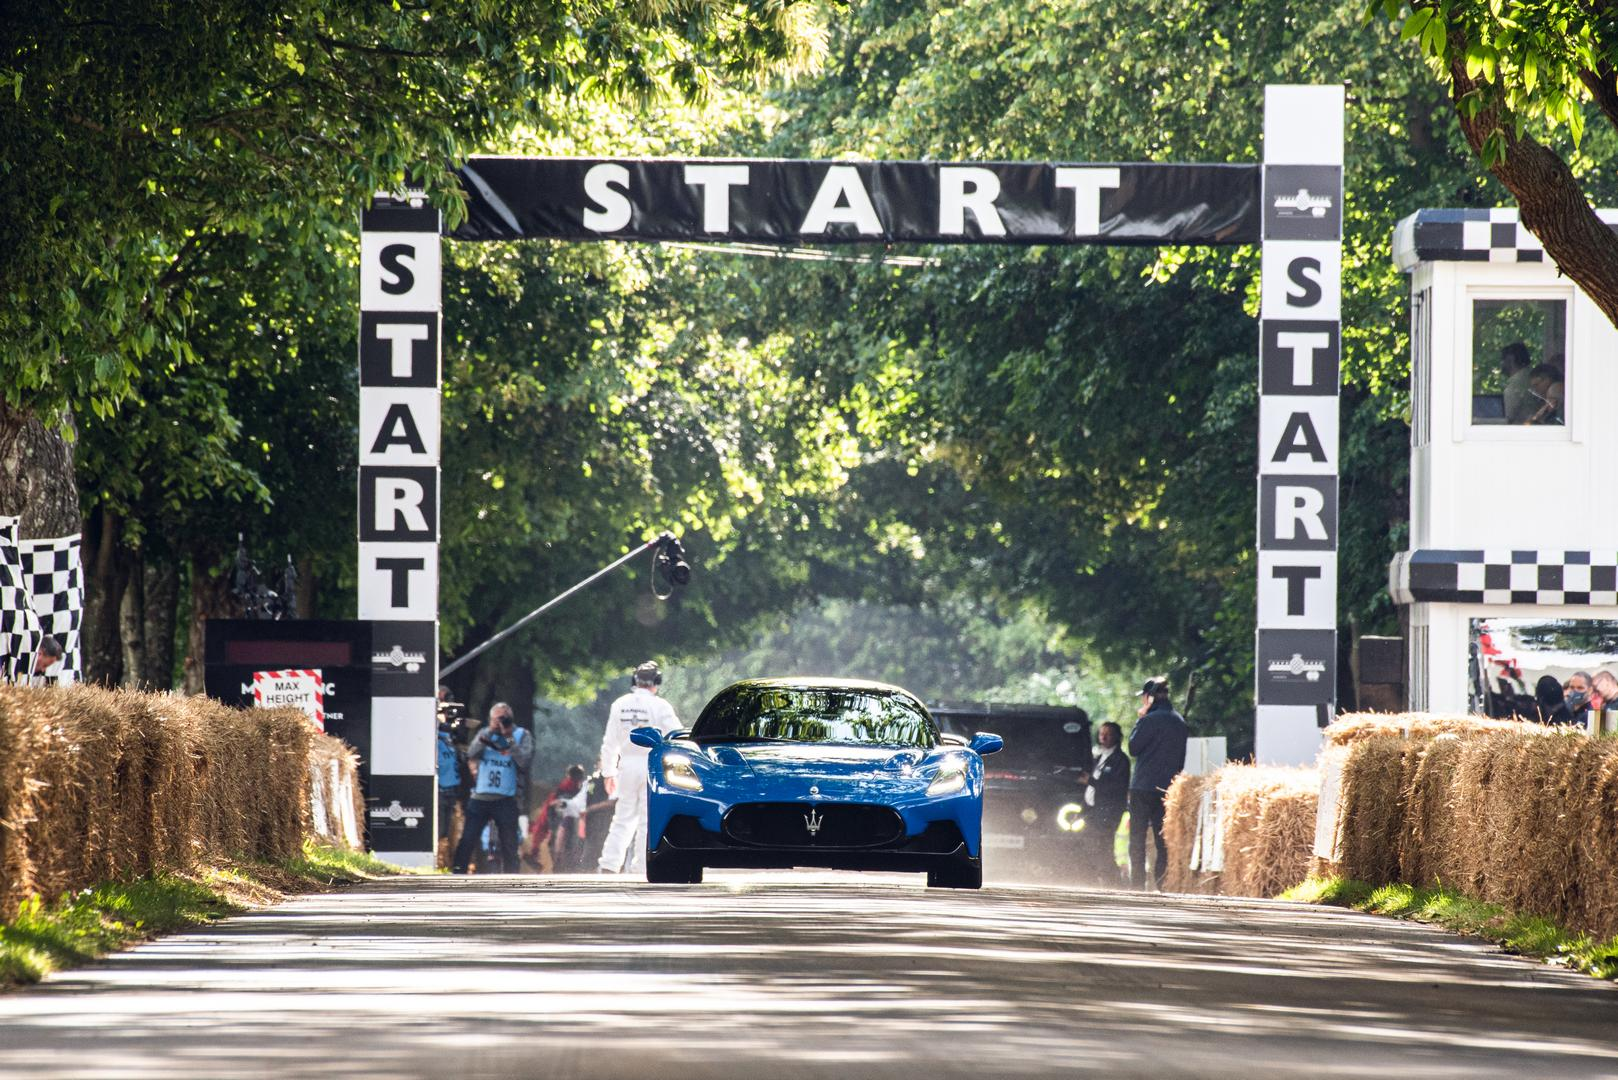 2022 Maserati MC20 Goodwood